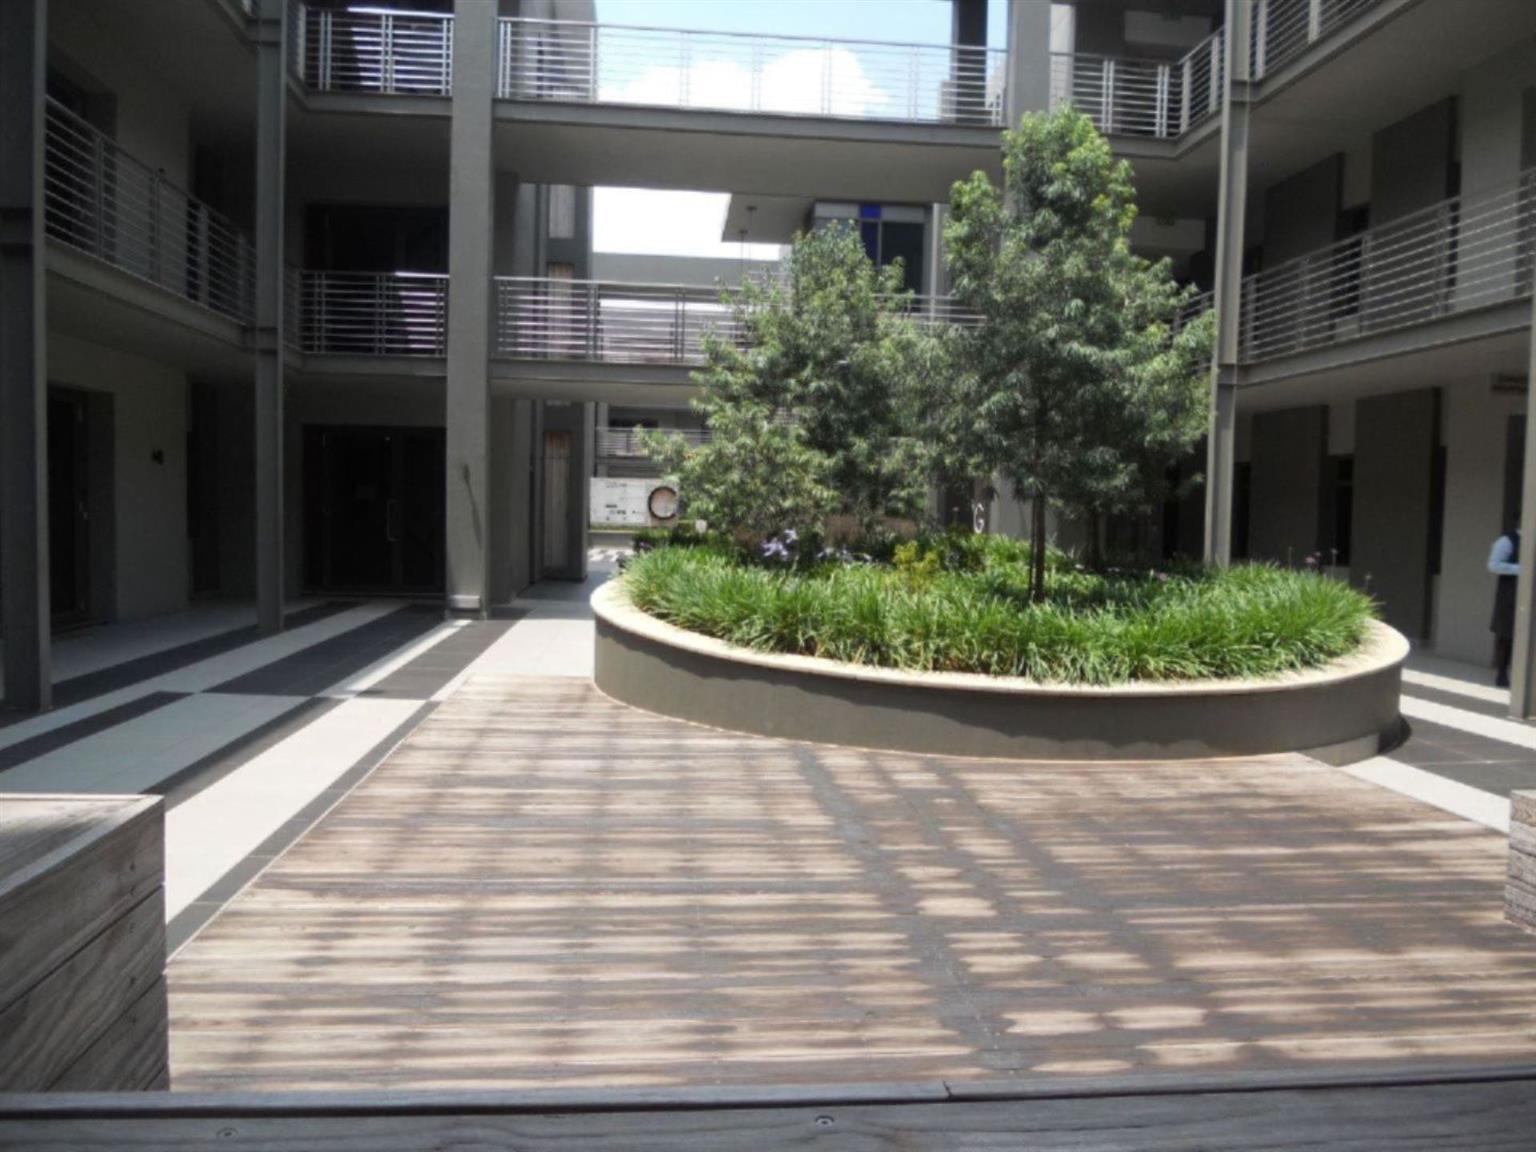 Office Rental Monthly in BEDFORDVIEW